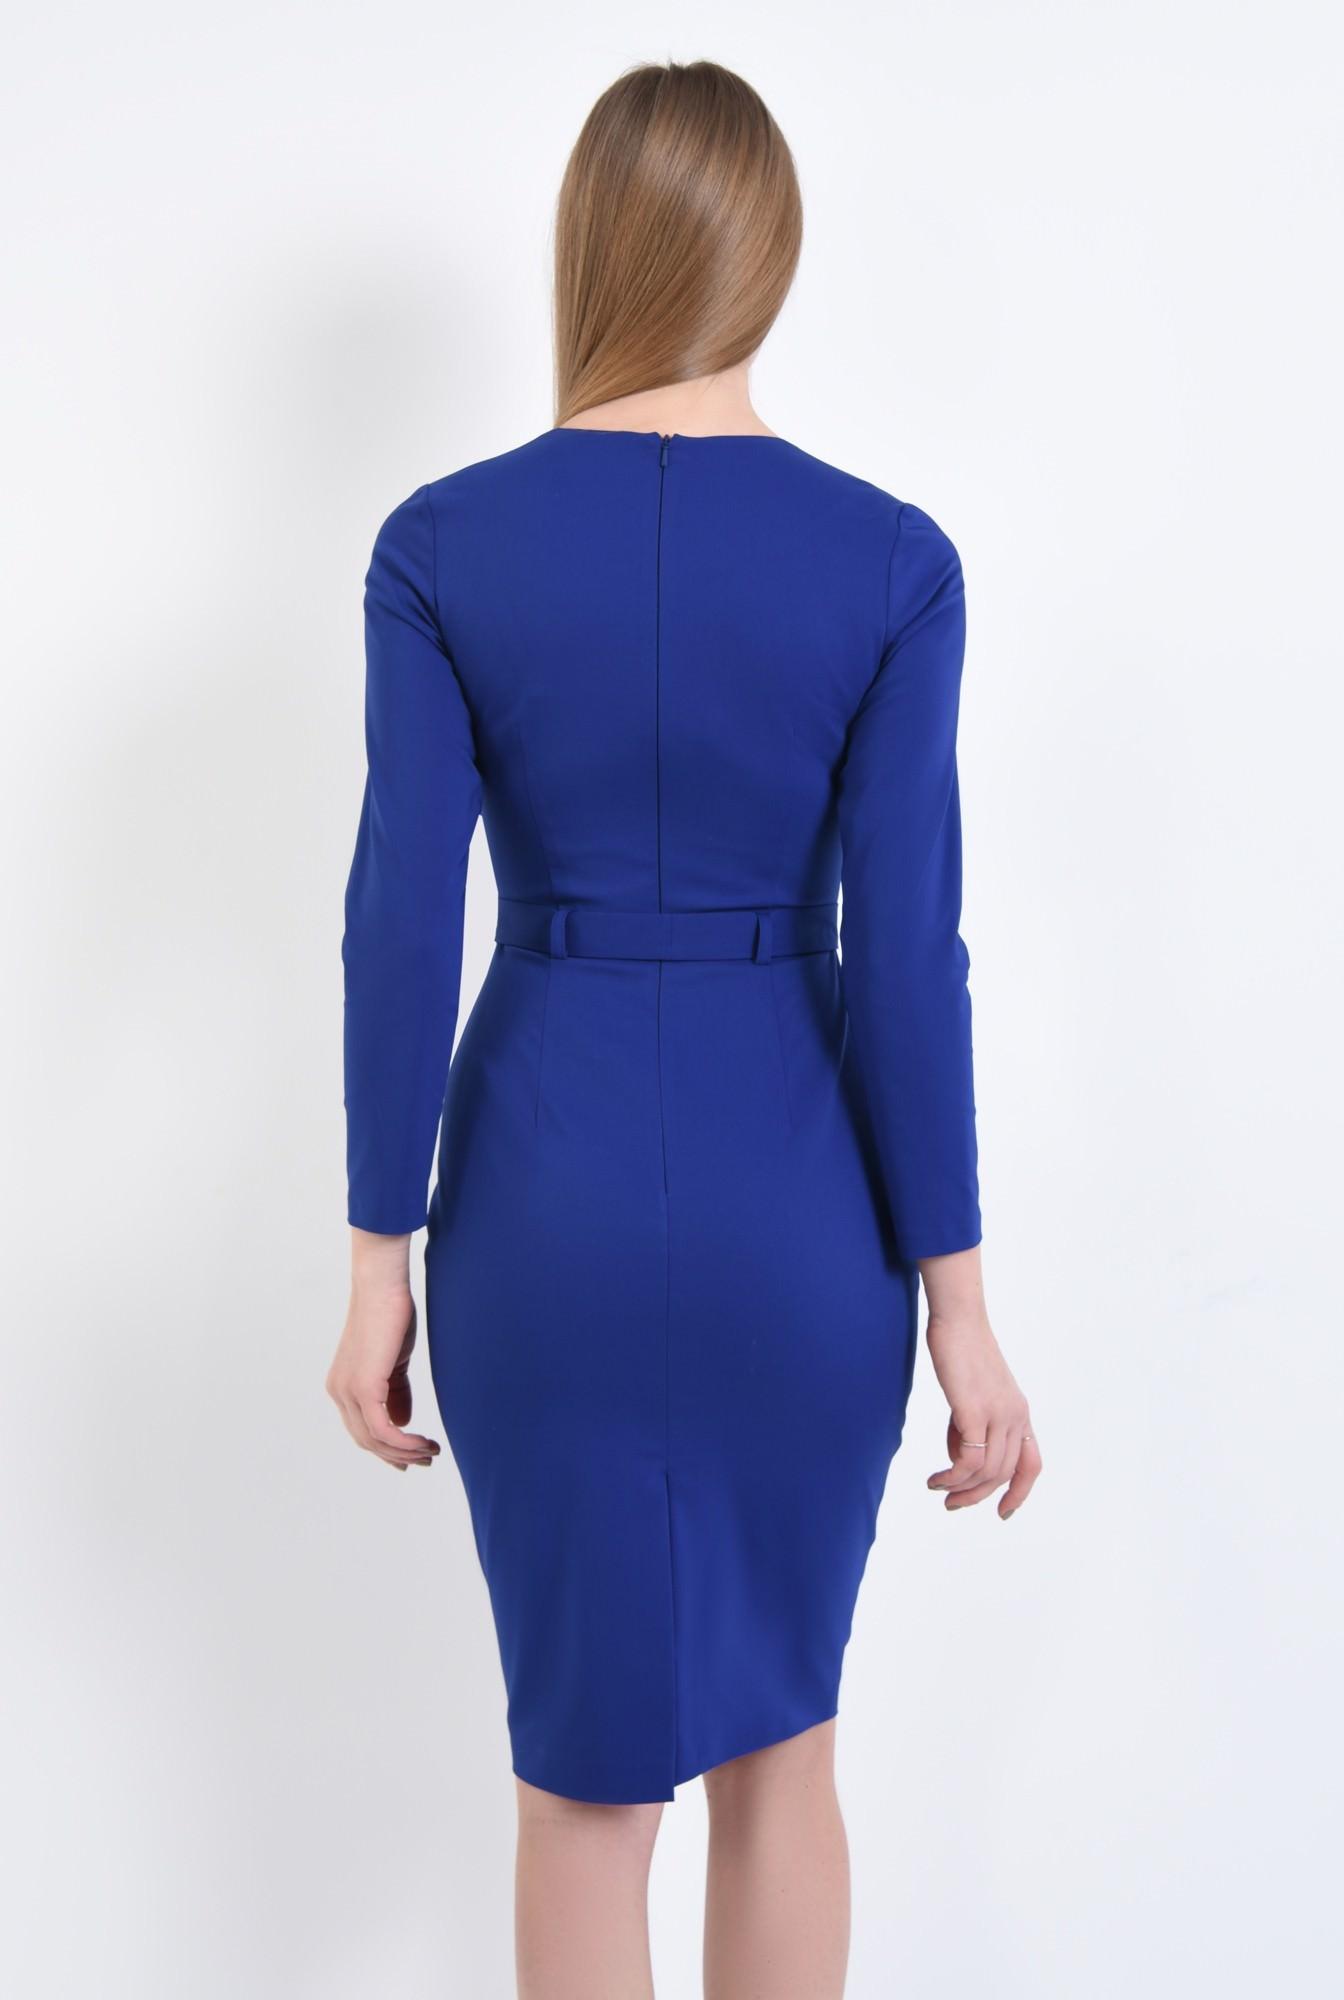 1 - rochie de zi, conica, albastru, cordon